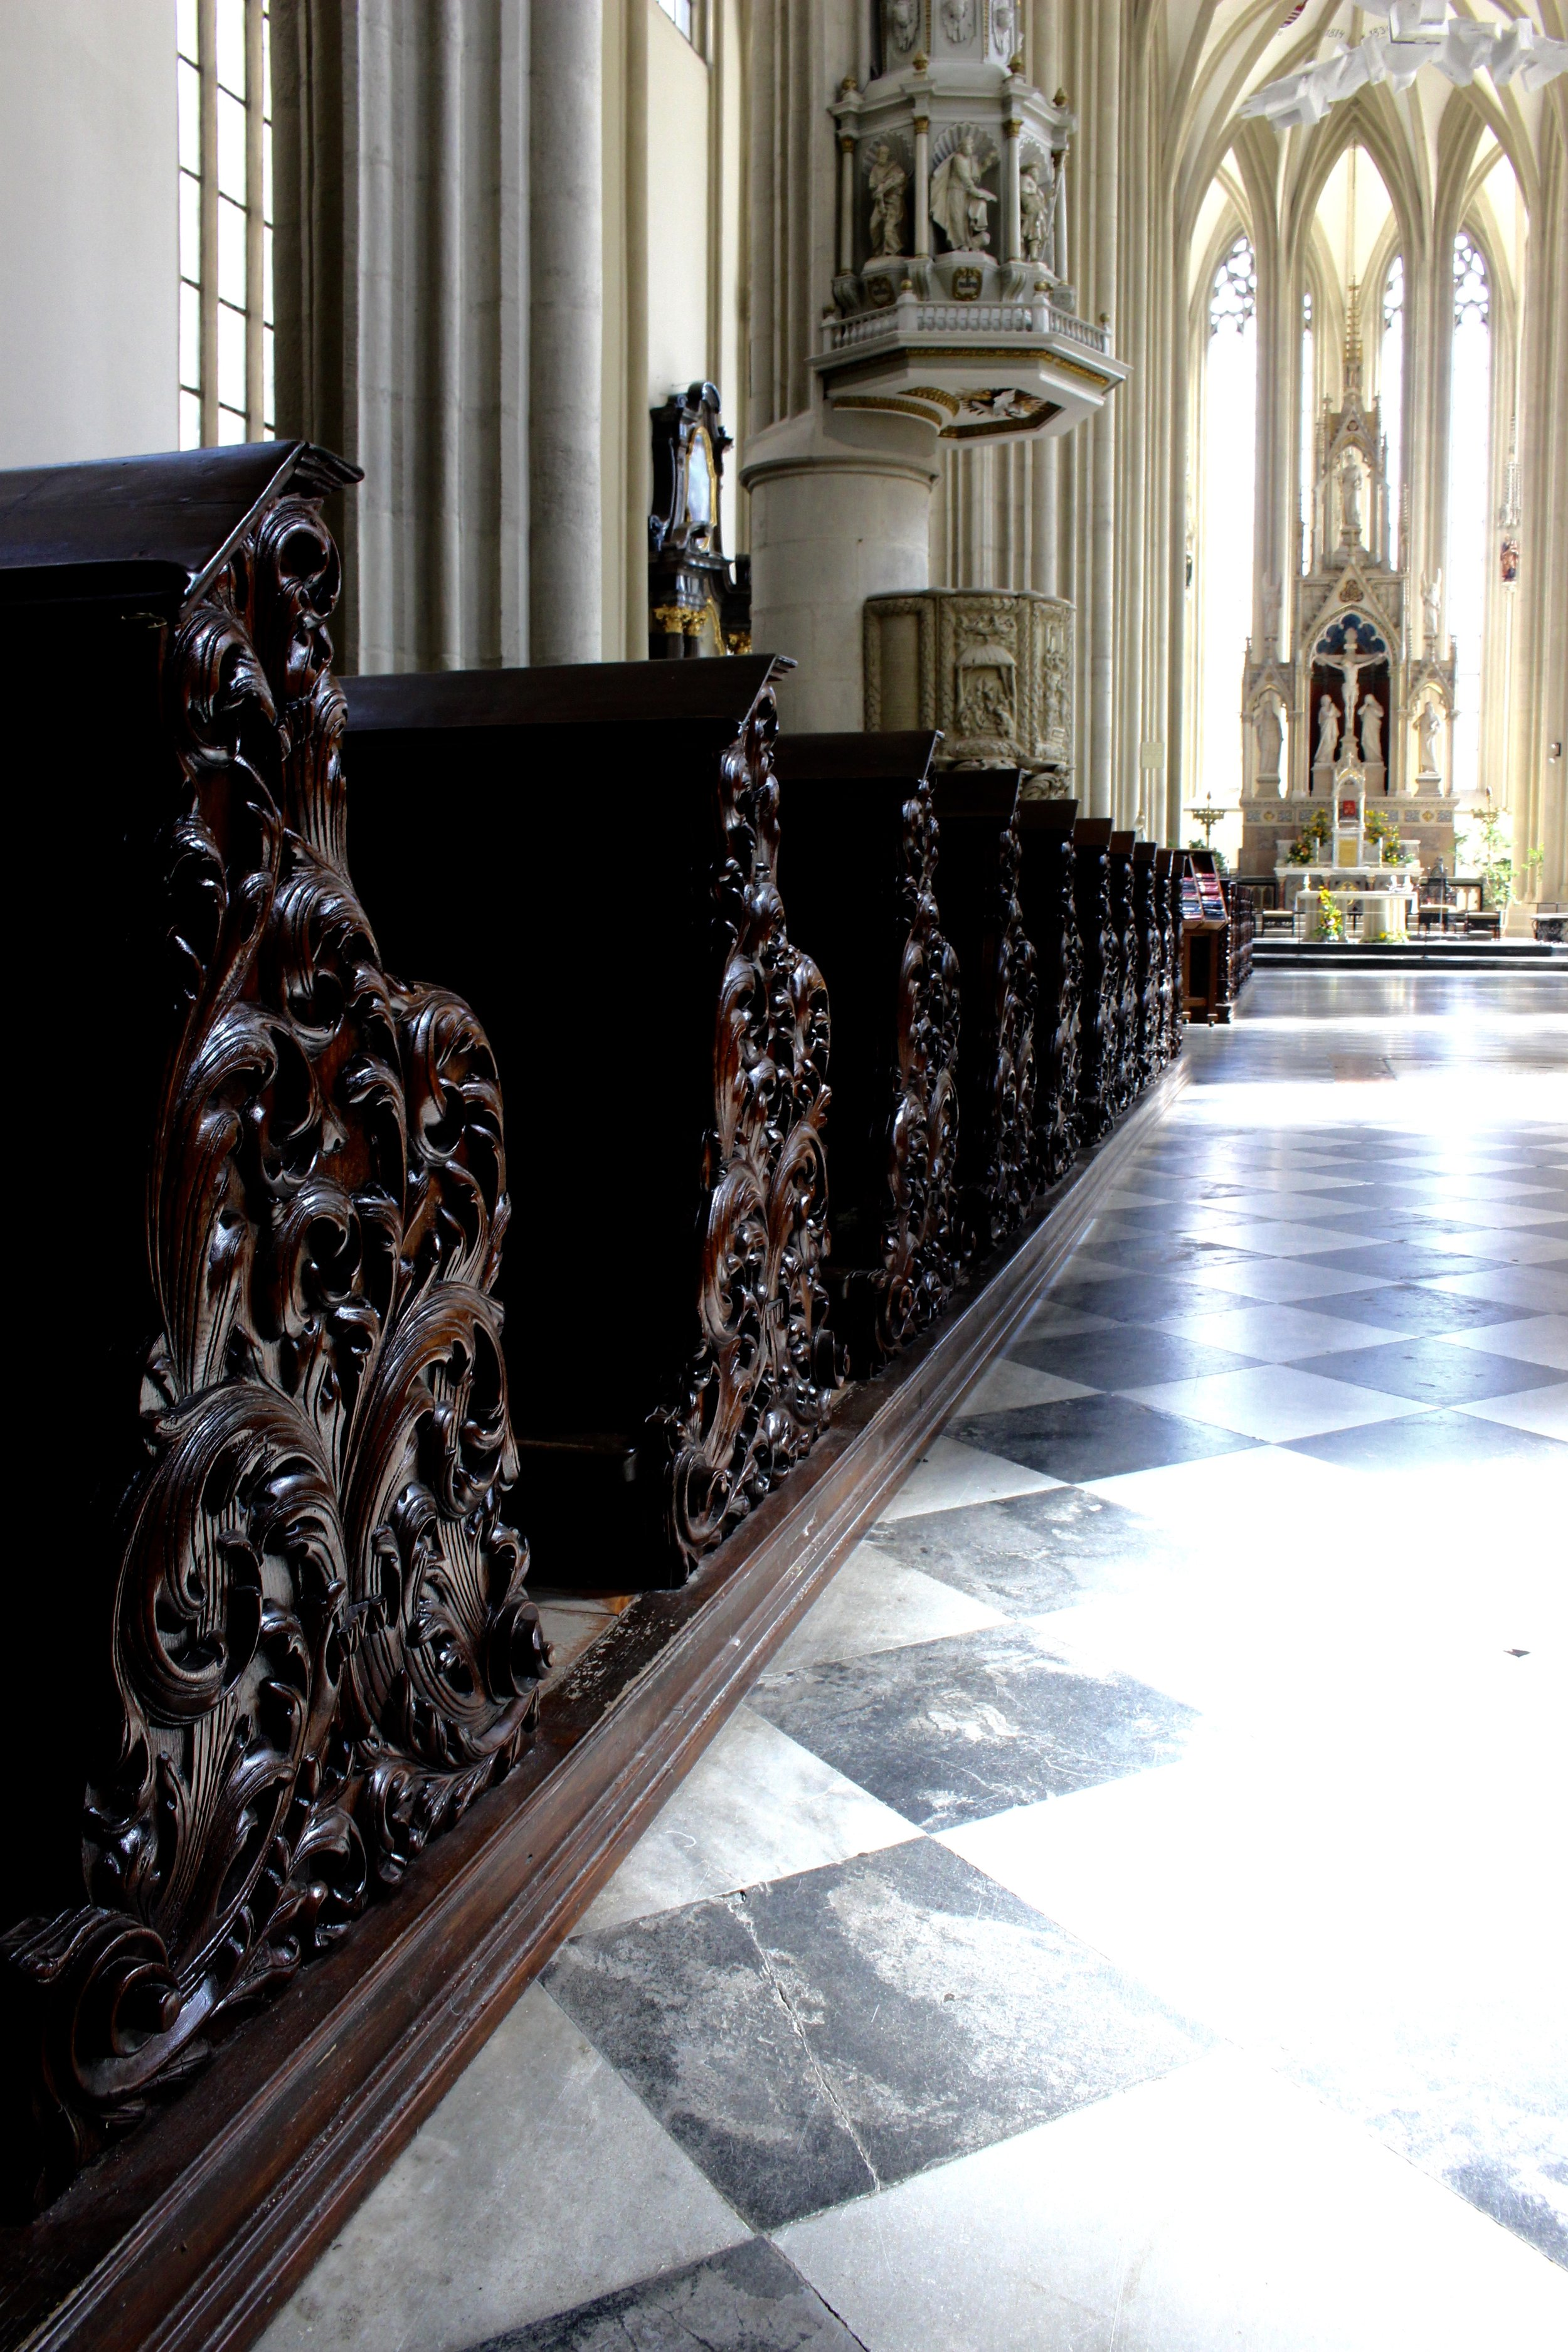 St. James' Church, Brno, Czechia